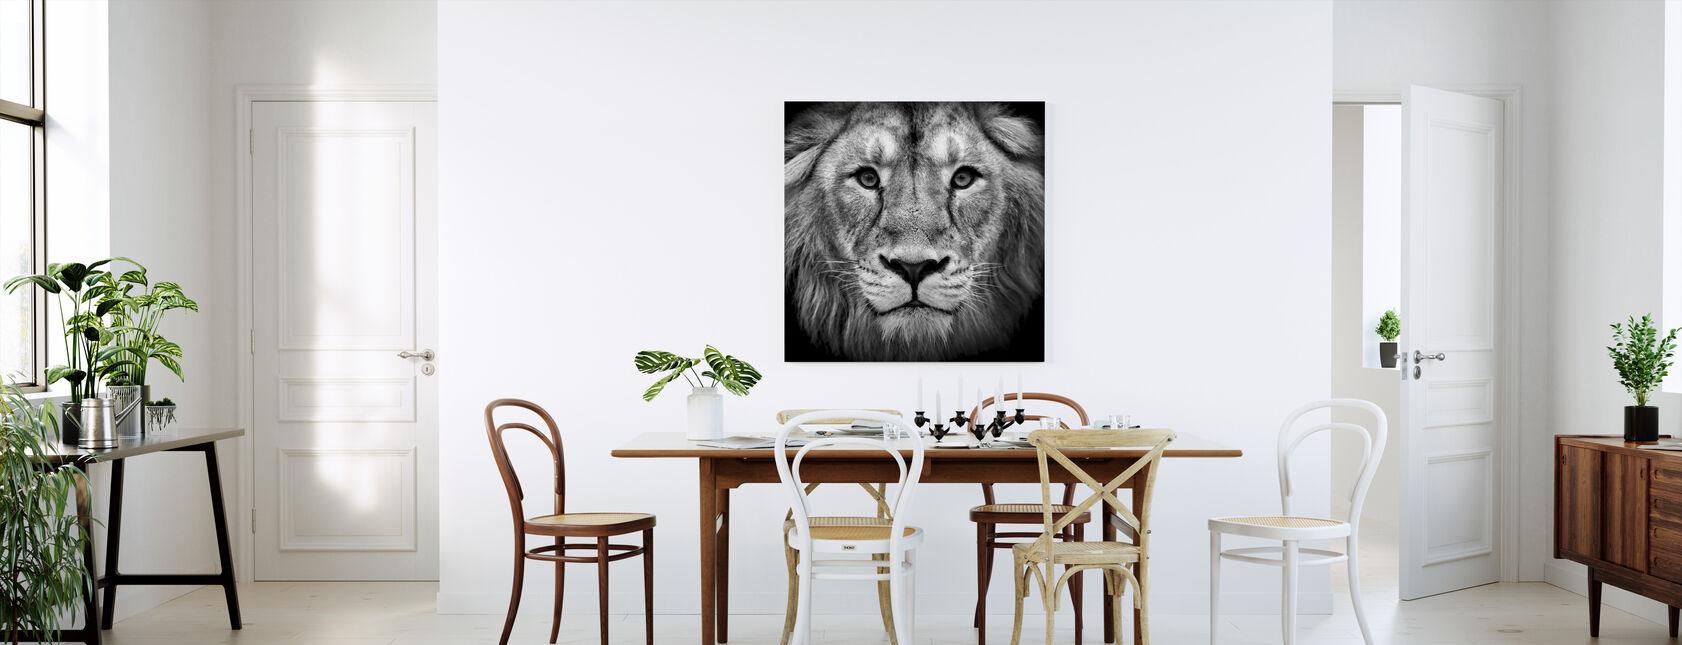 Leeuwen & grote katten